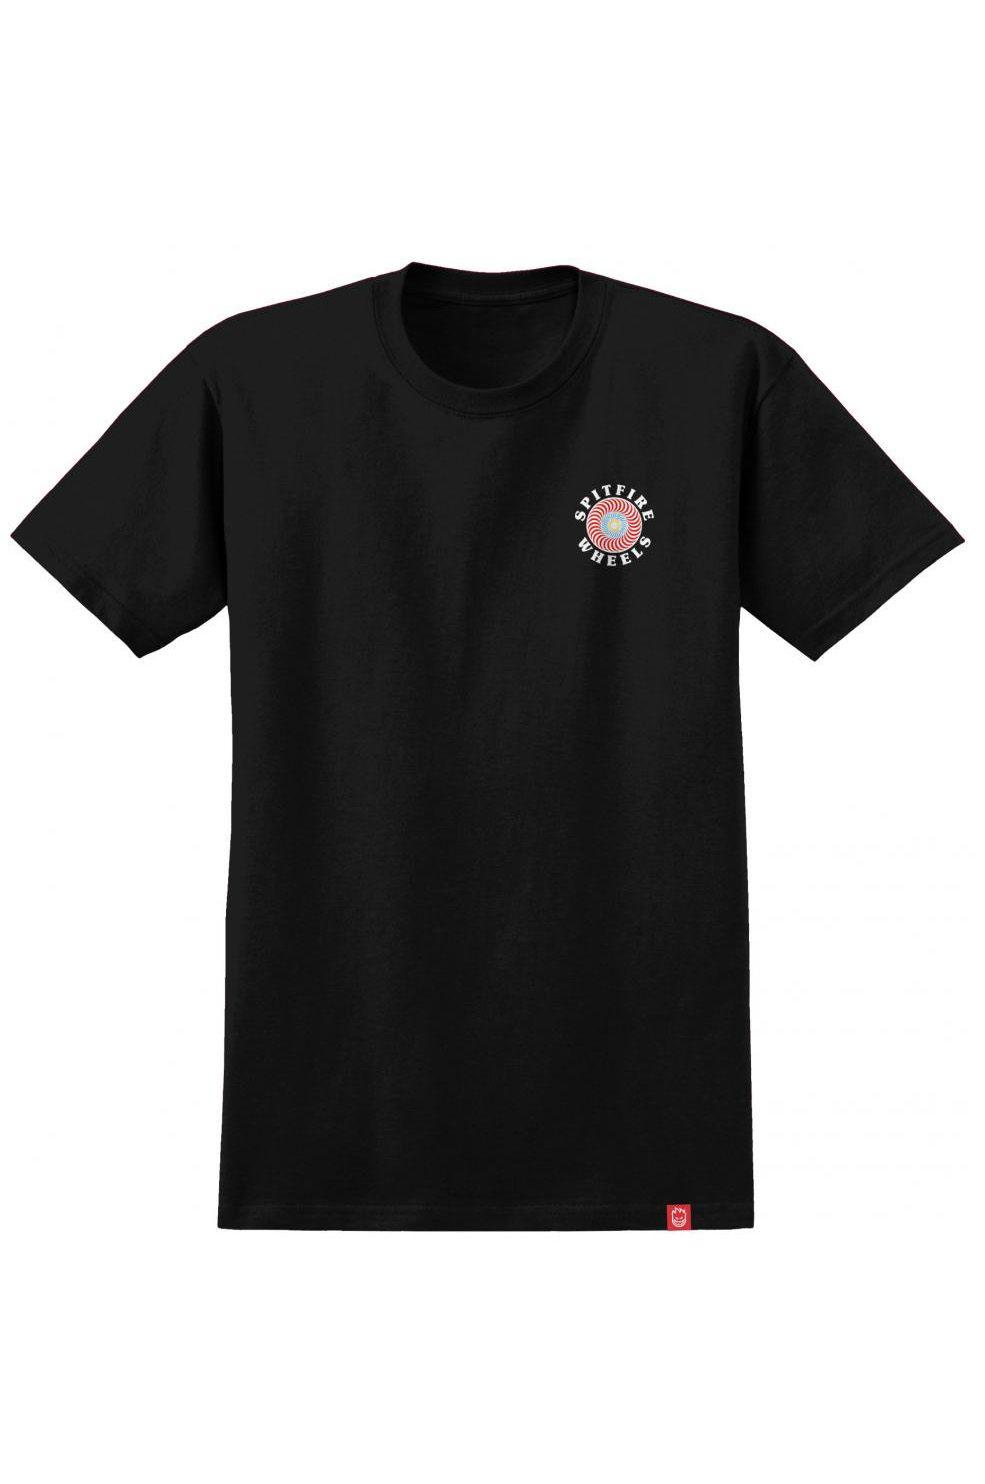 T-Shirt Spitfire OG CLASSIC FILL Black/Multi-Colored